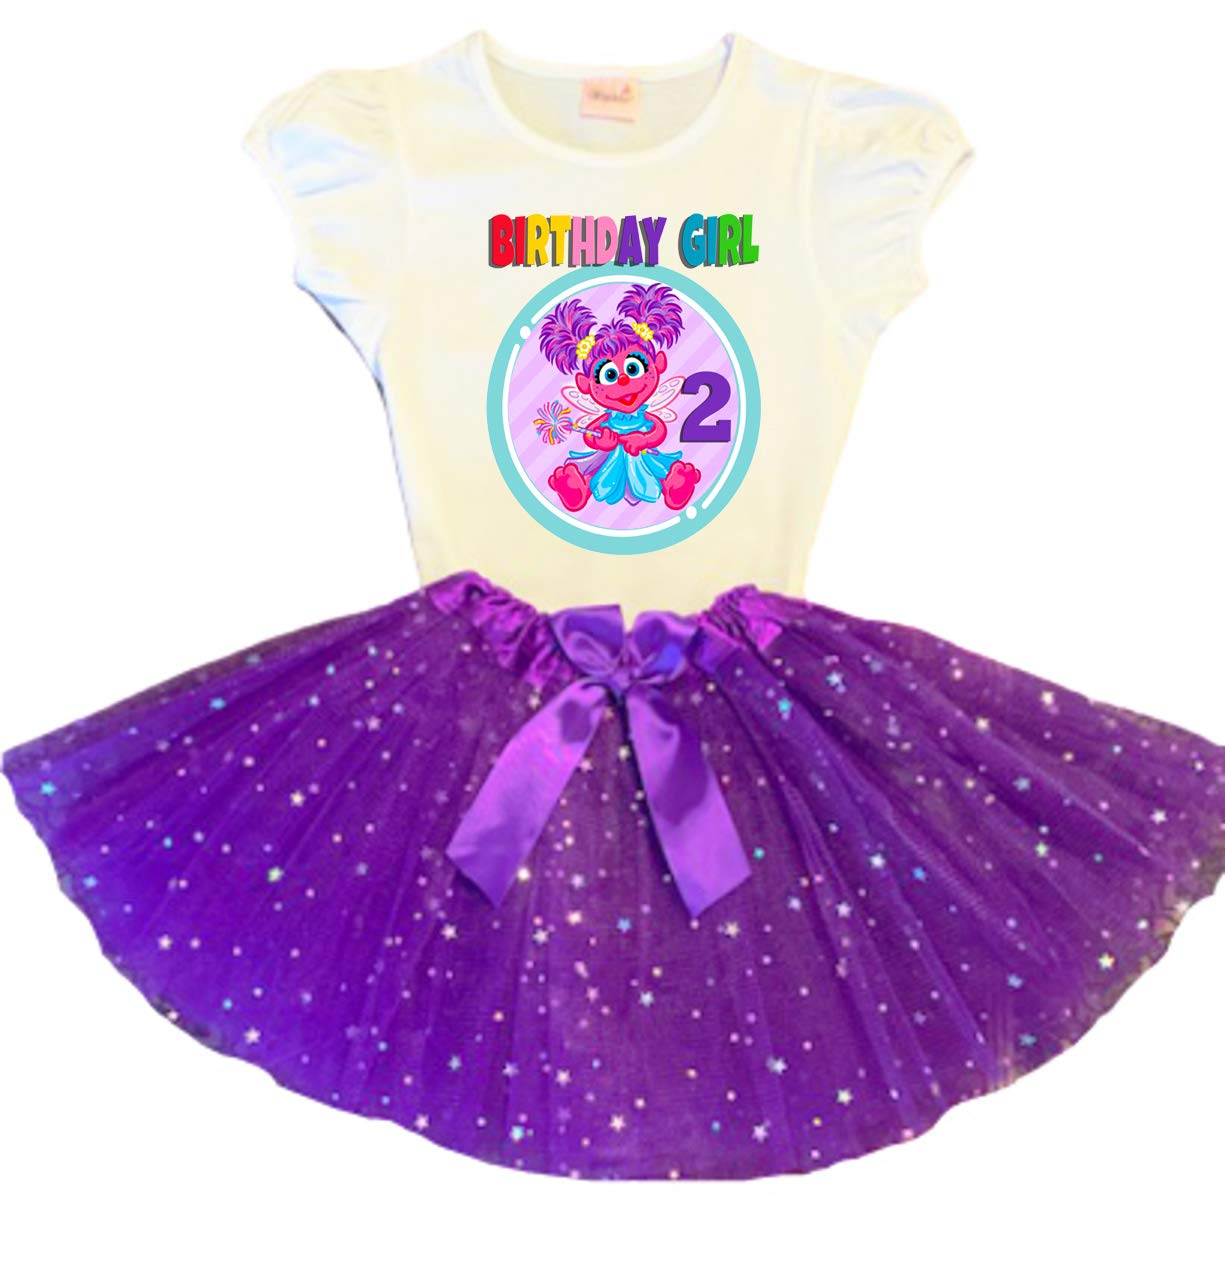 Abby Cadabby Birthday Shirt Tutu Set Two Legit To Quit Birthday Outfit Abby Cadabby Second Birthday Outfit Girls Second Birthday Outfit